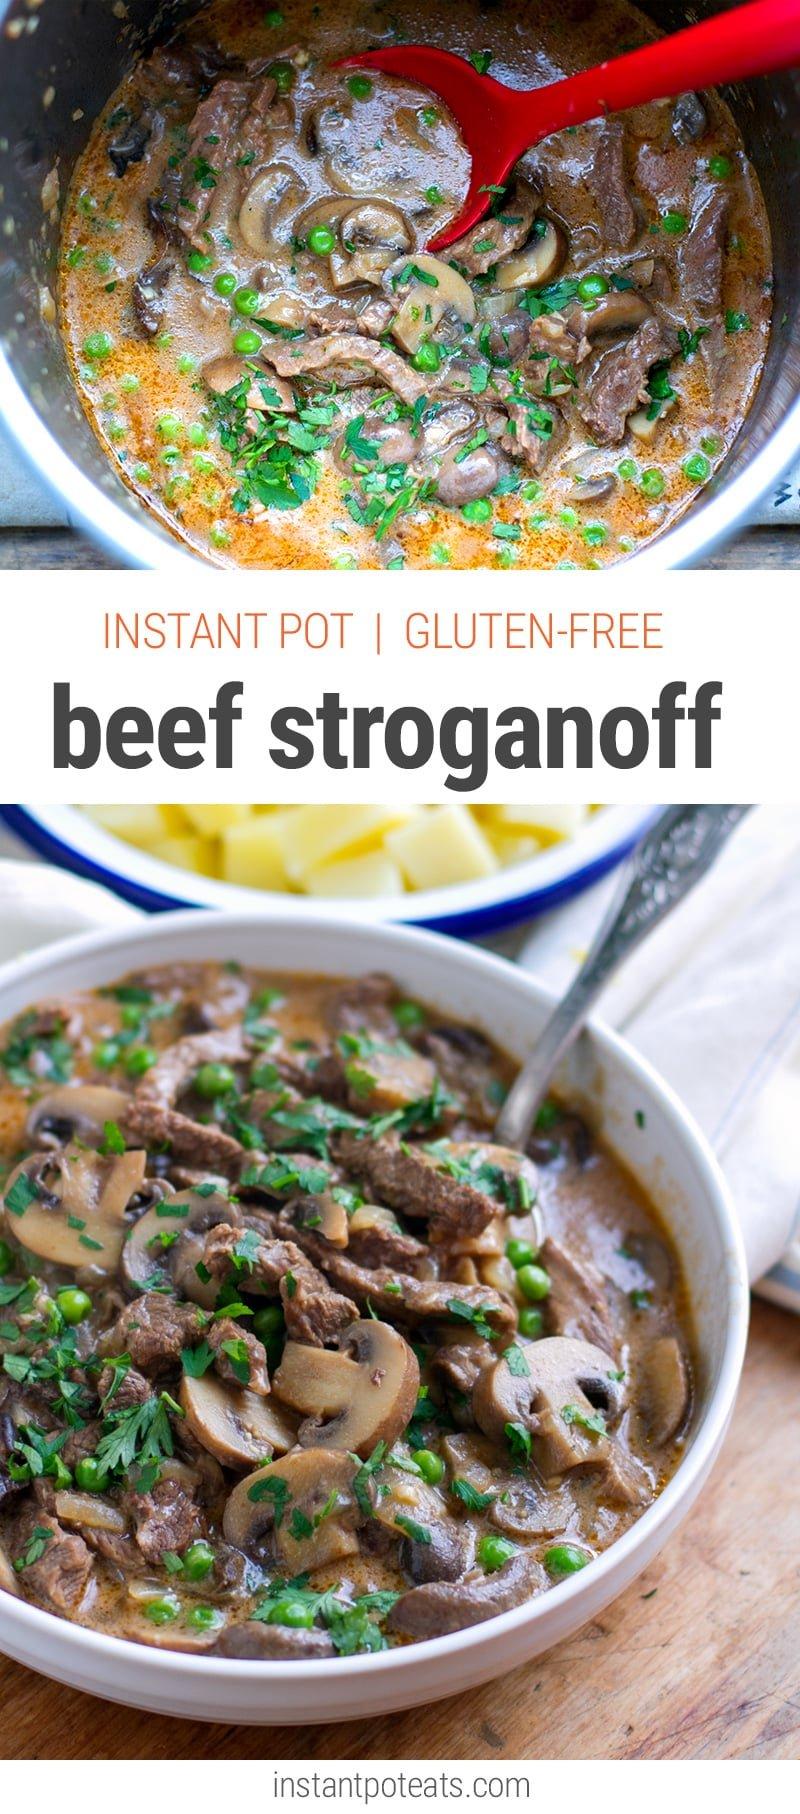 Quick & Easy Instant Pot Beef Stroganoff (Gluten-Free Recipe)